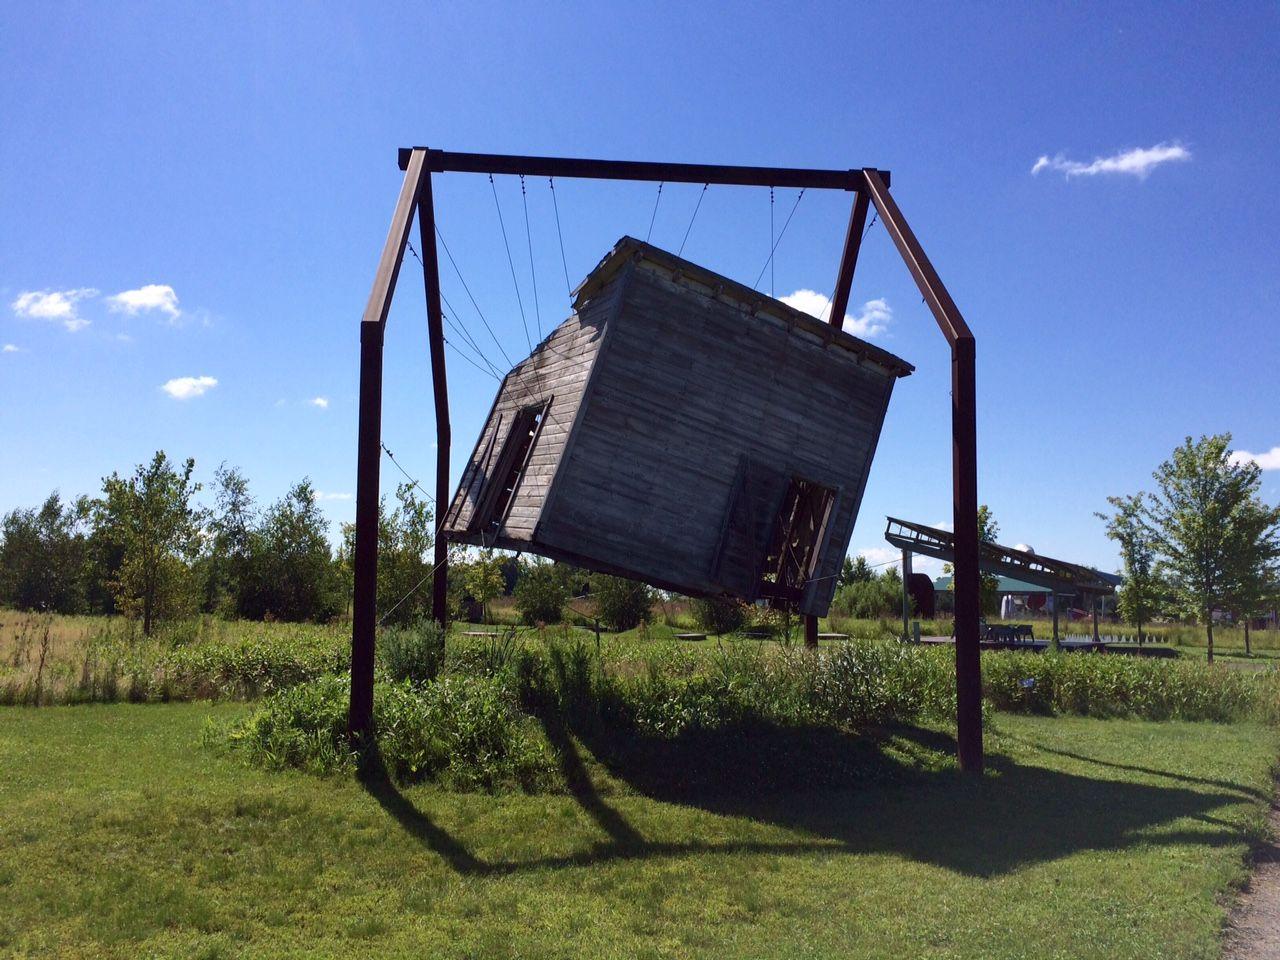 Finding Minnesota: Franconia Sculpture Park